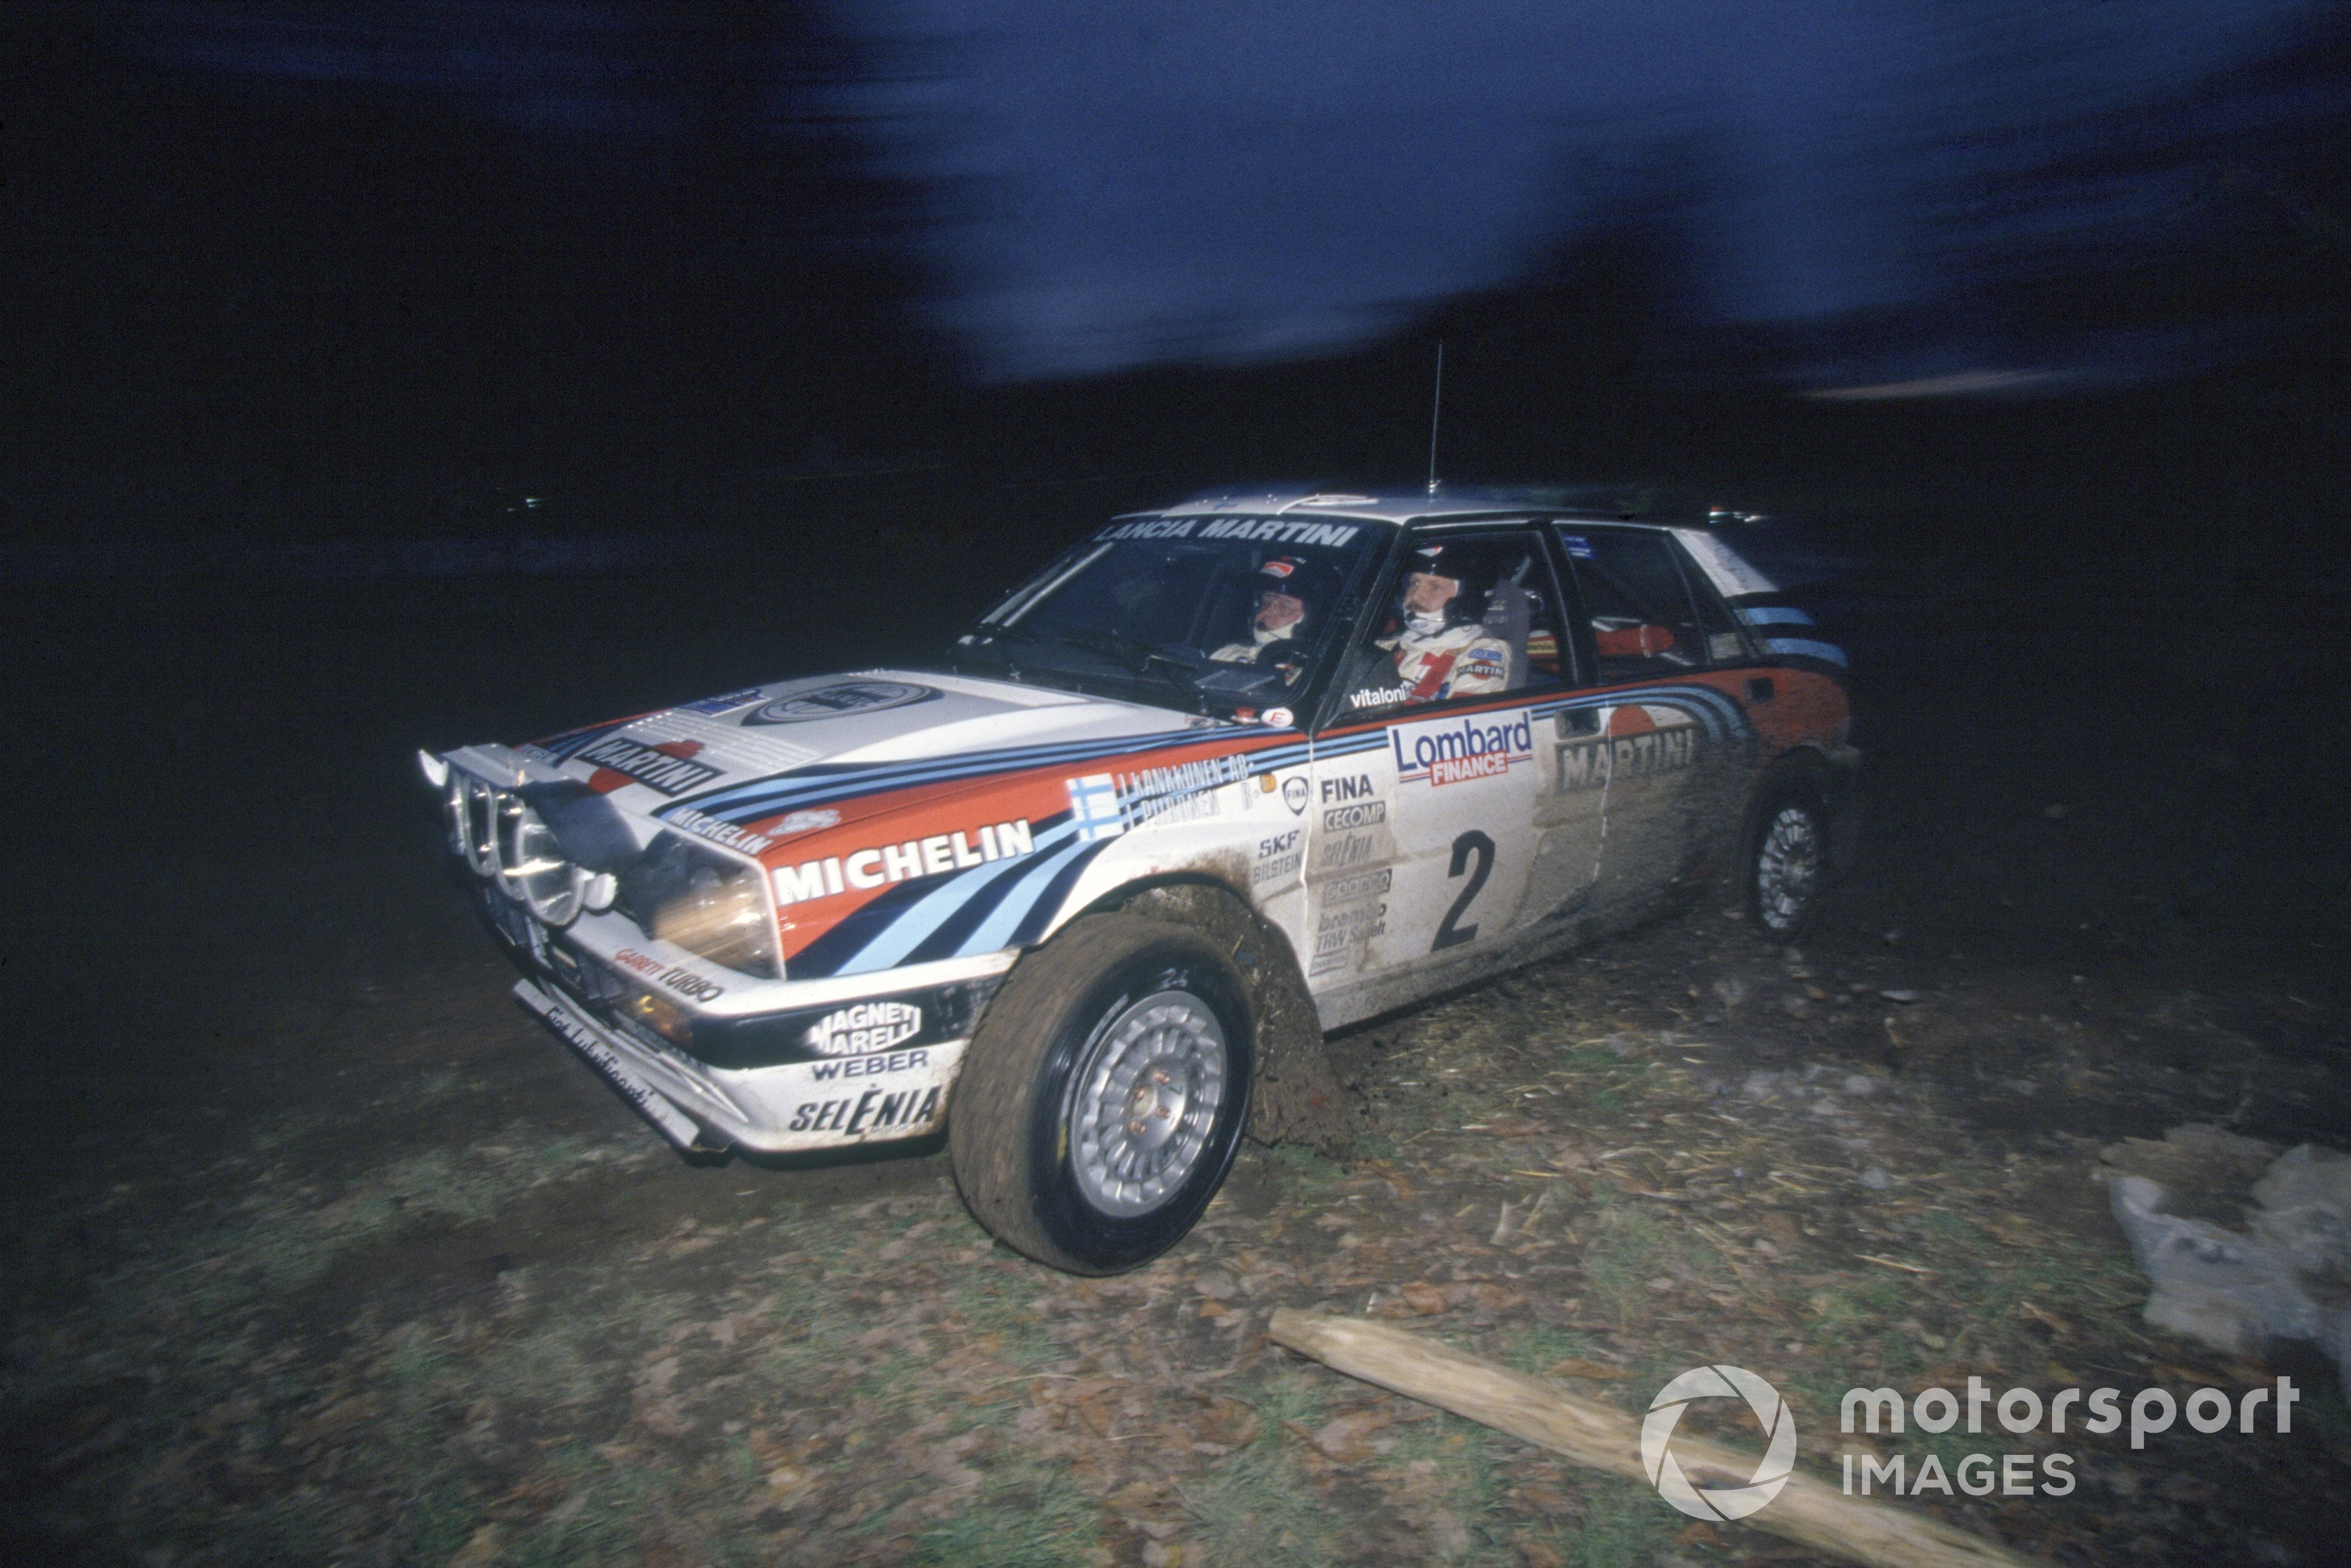 Juha Kankkunen and Juha Piironen were winners of the 1991 Lombard RAC Rally.